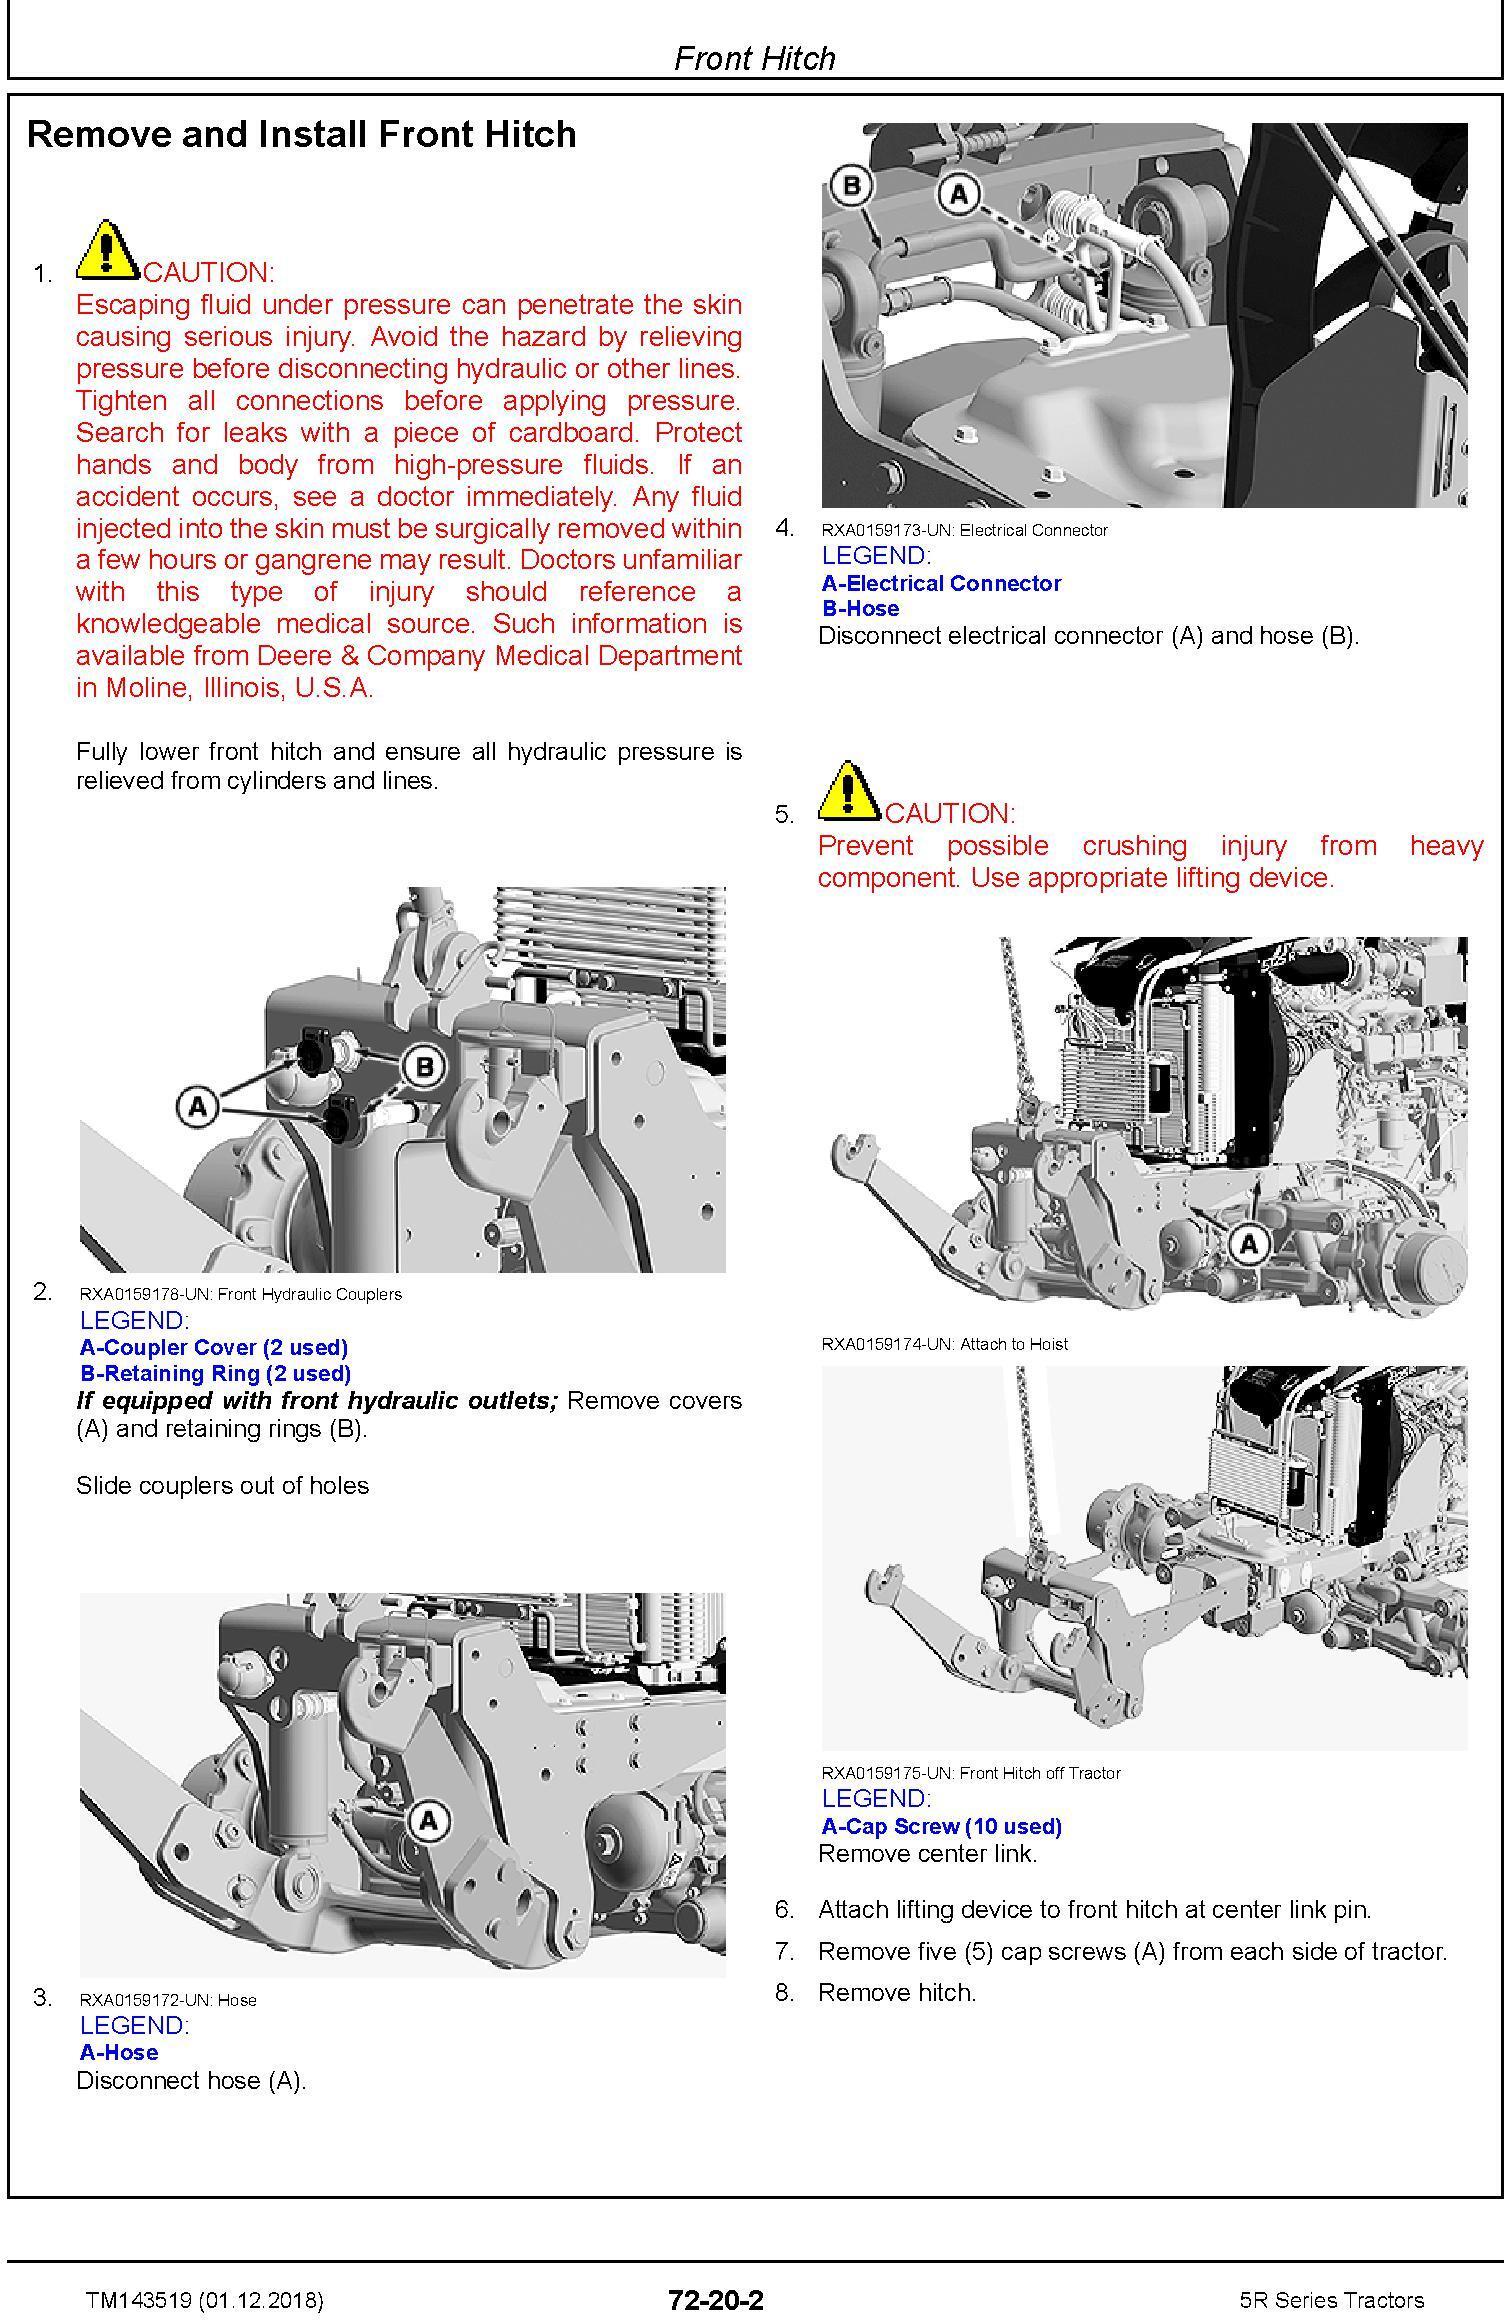 John Deere 5090R, 5100R, 5115R, 5115RH, 5125R Tractors Repair Technical Service Manual (TM143519) - 2